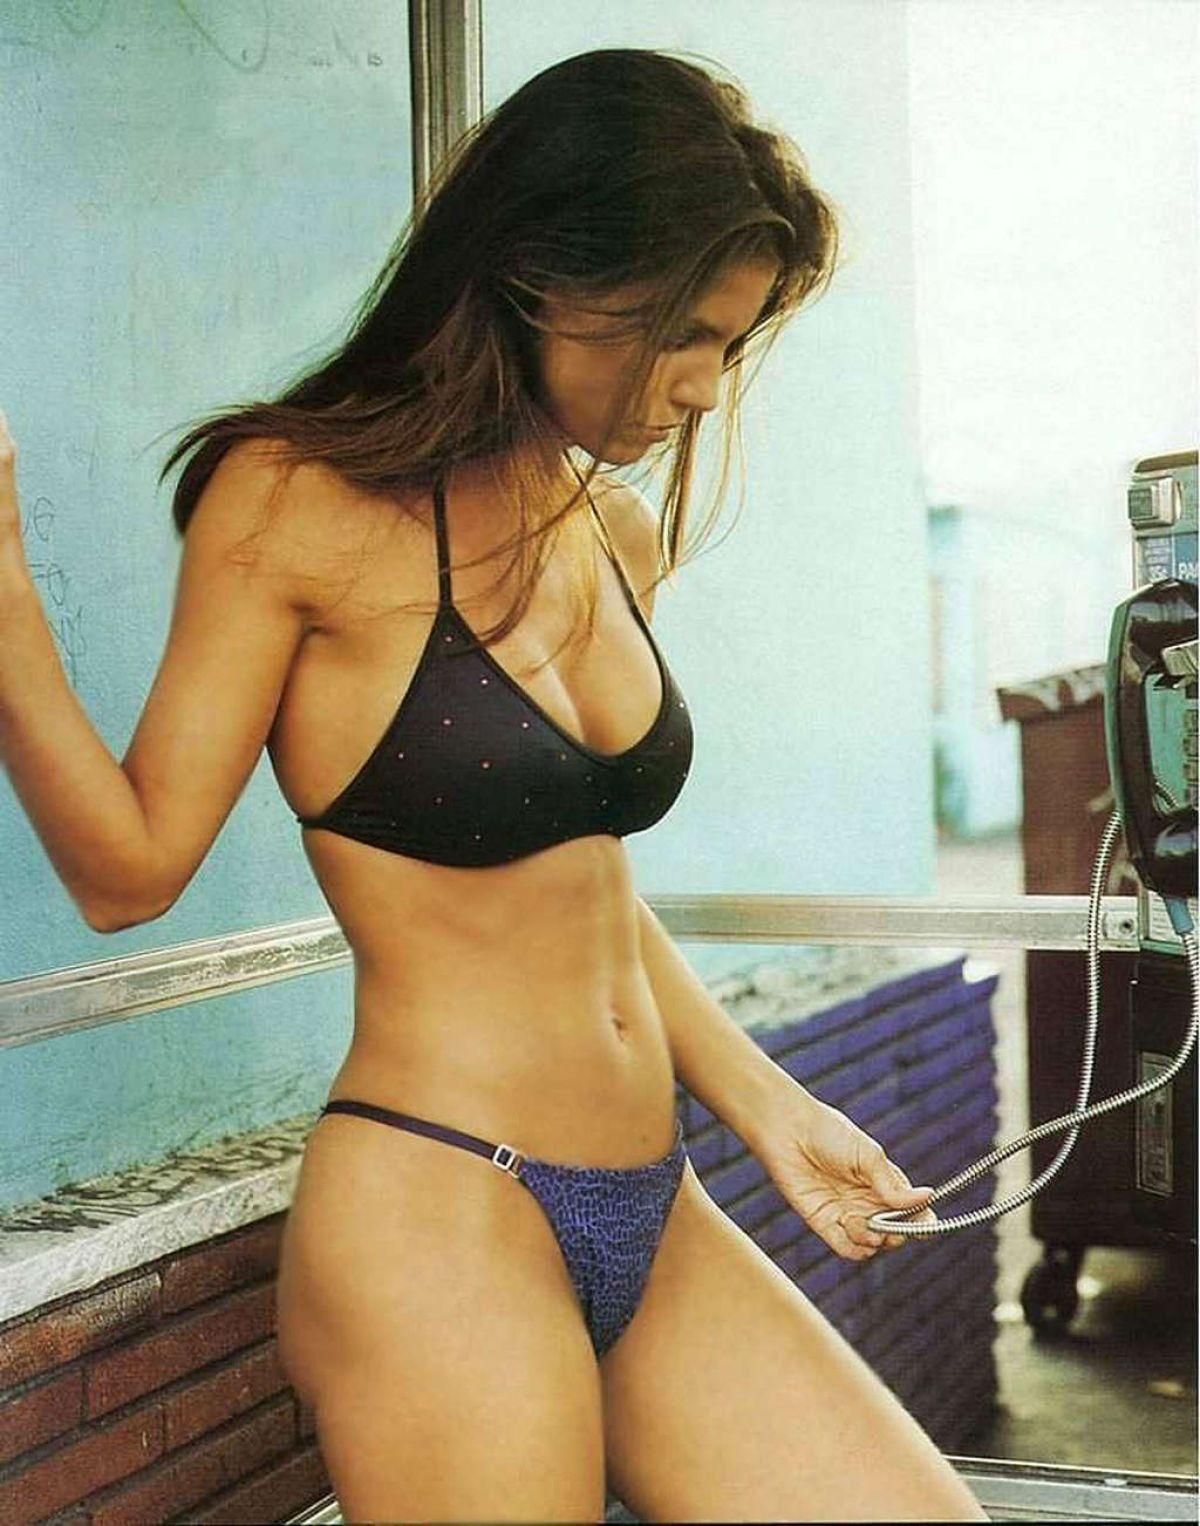 Best from the Past - CHARISMA CARPENTER in Bikini, Magazine Scans 1999